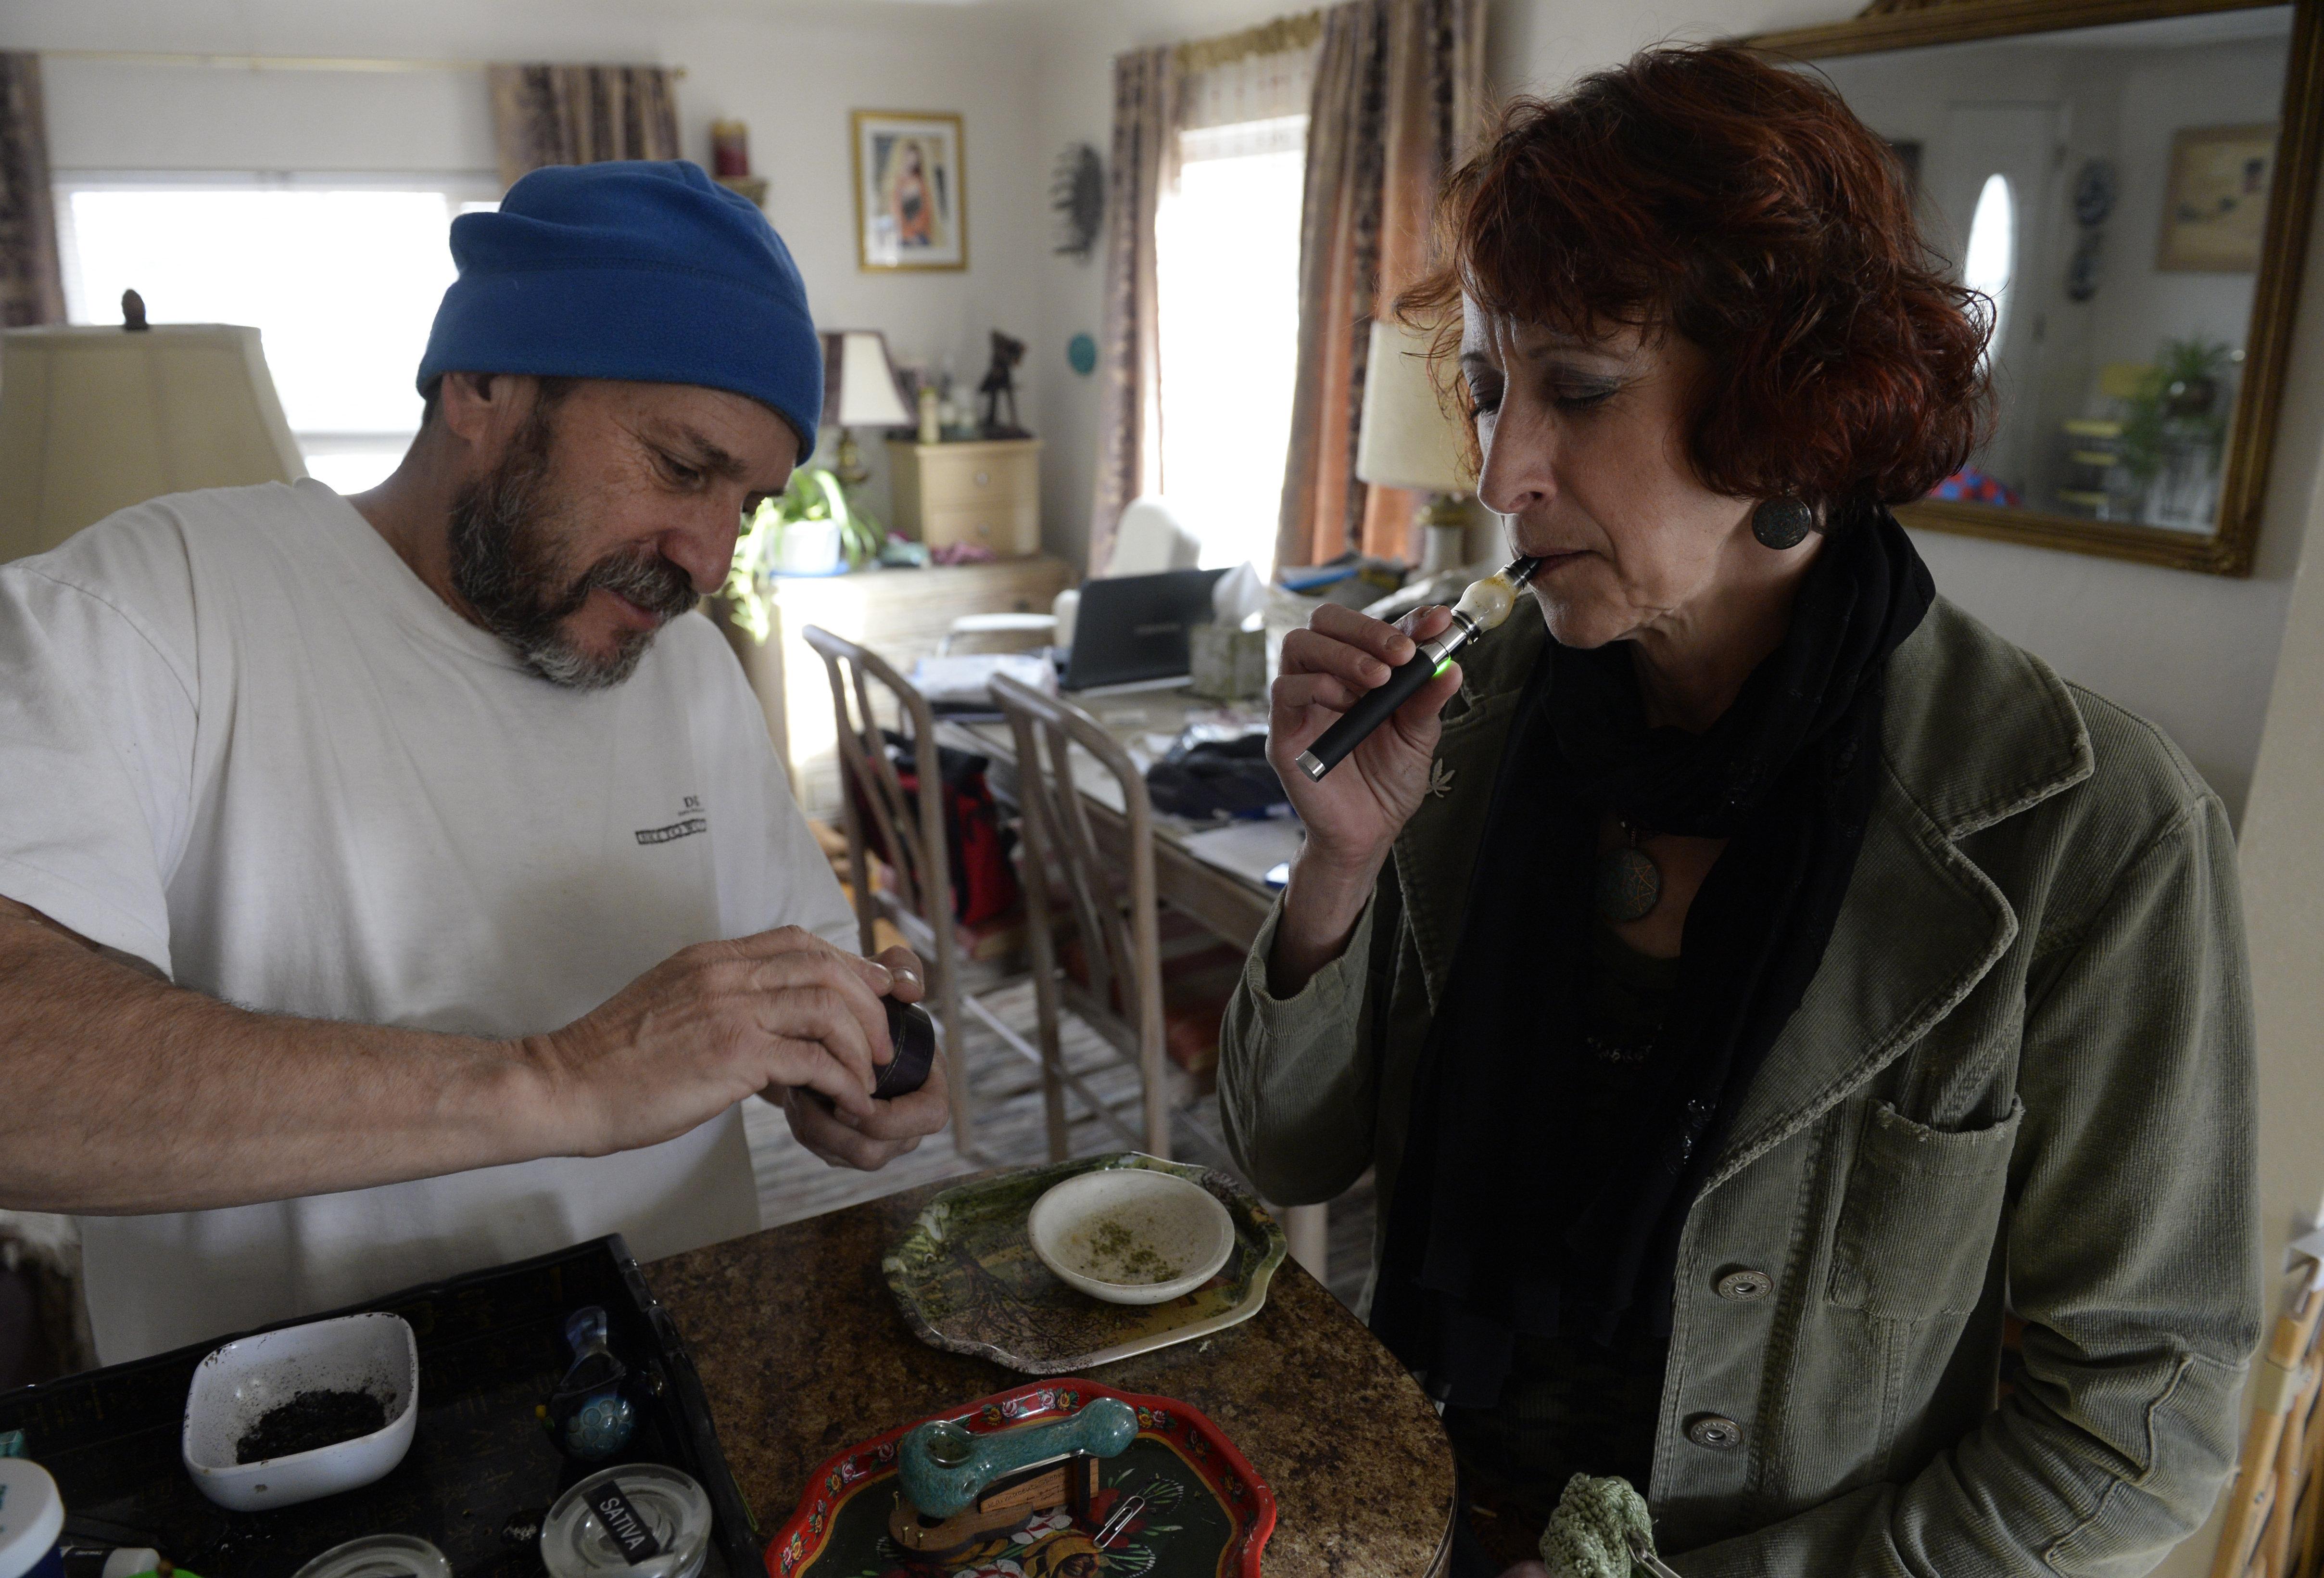 Colorado medical marijuana patient Teri Robnett, right, uses a vape pen to manage chronic fibromyalgia. A majority of Colorad